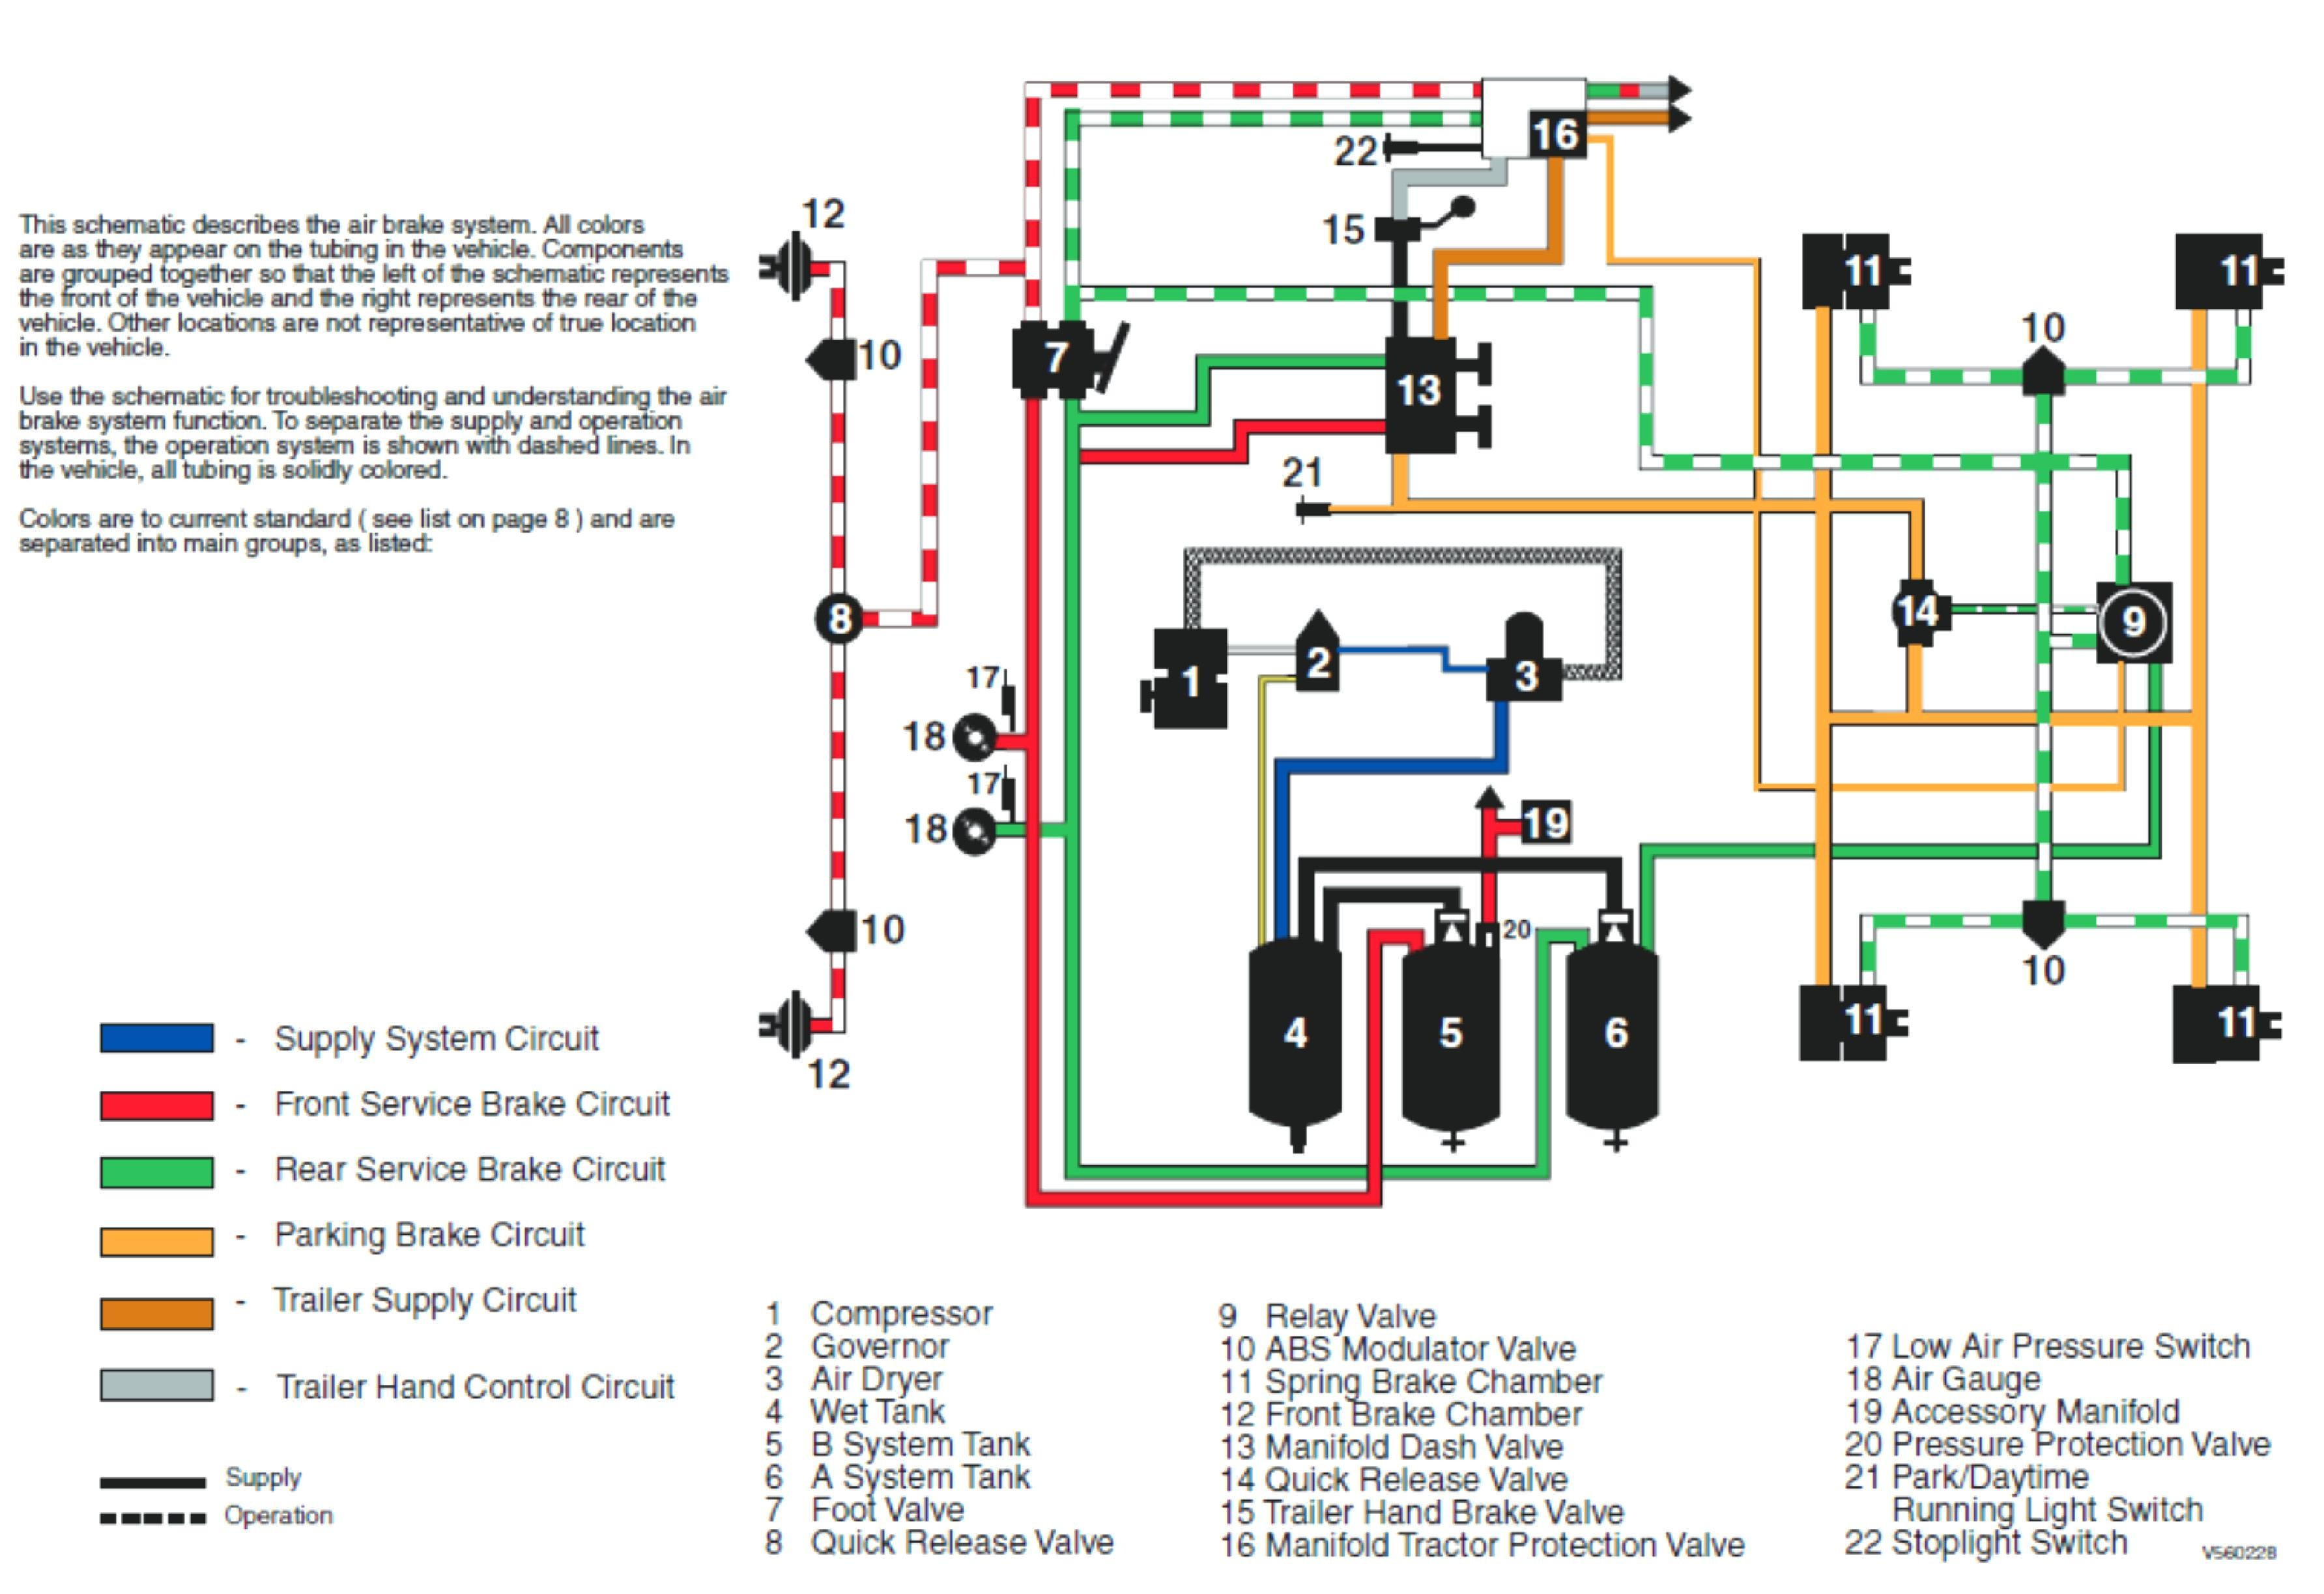 Air Brake System Diagram Travel Trailer Battery Hookup Diagram Tractor Air Brake System